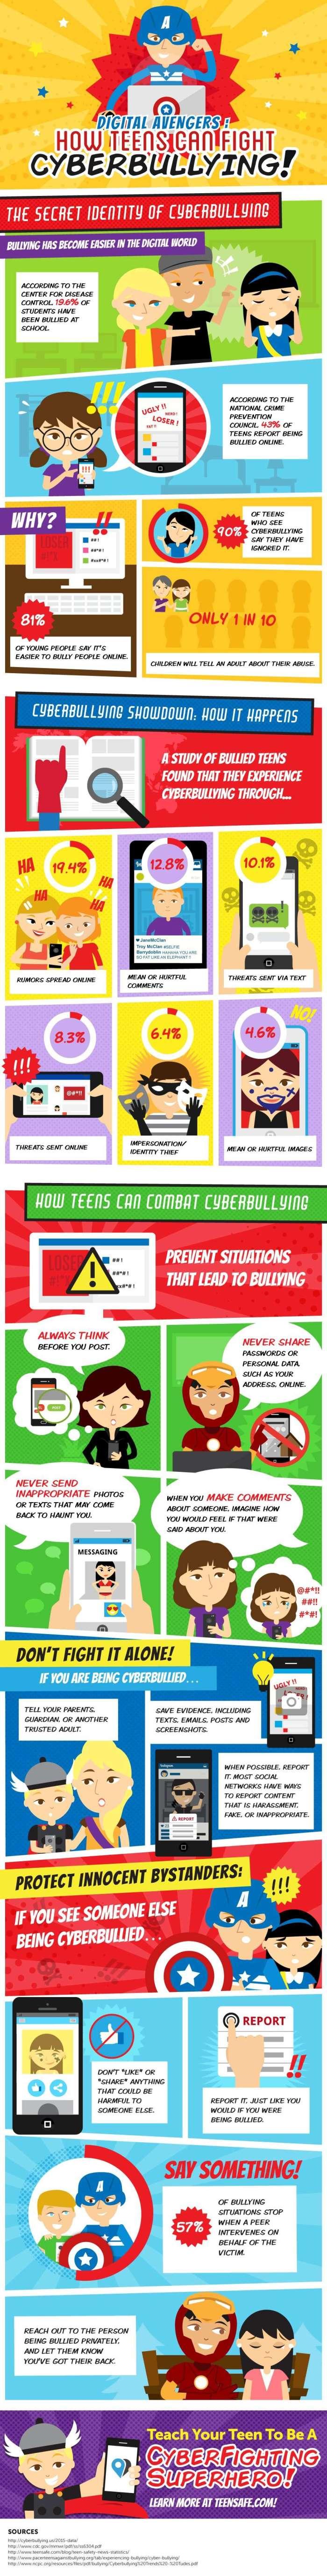 Cyberbullying: Raising Kids That Help Stop Bullies